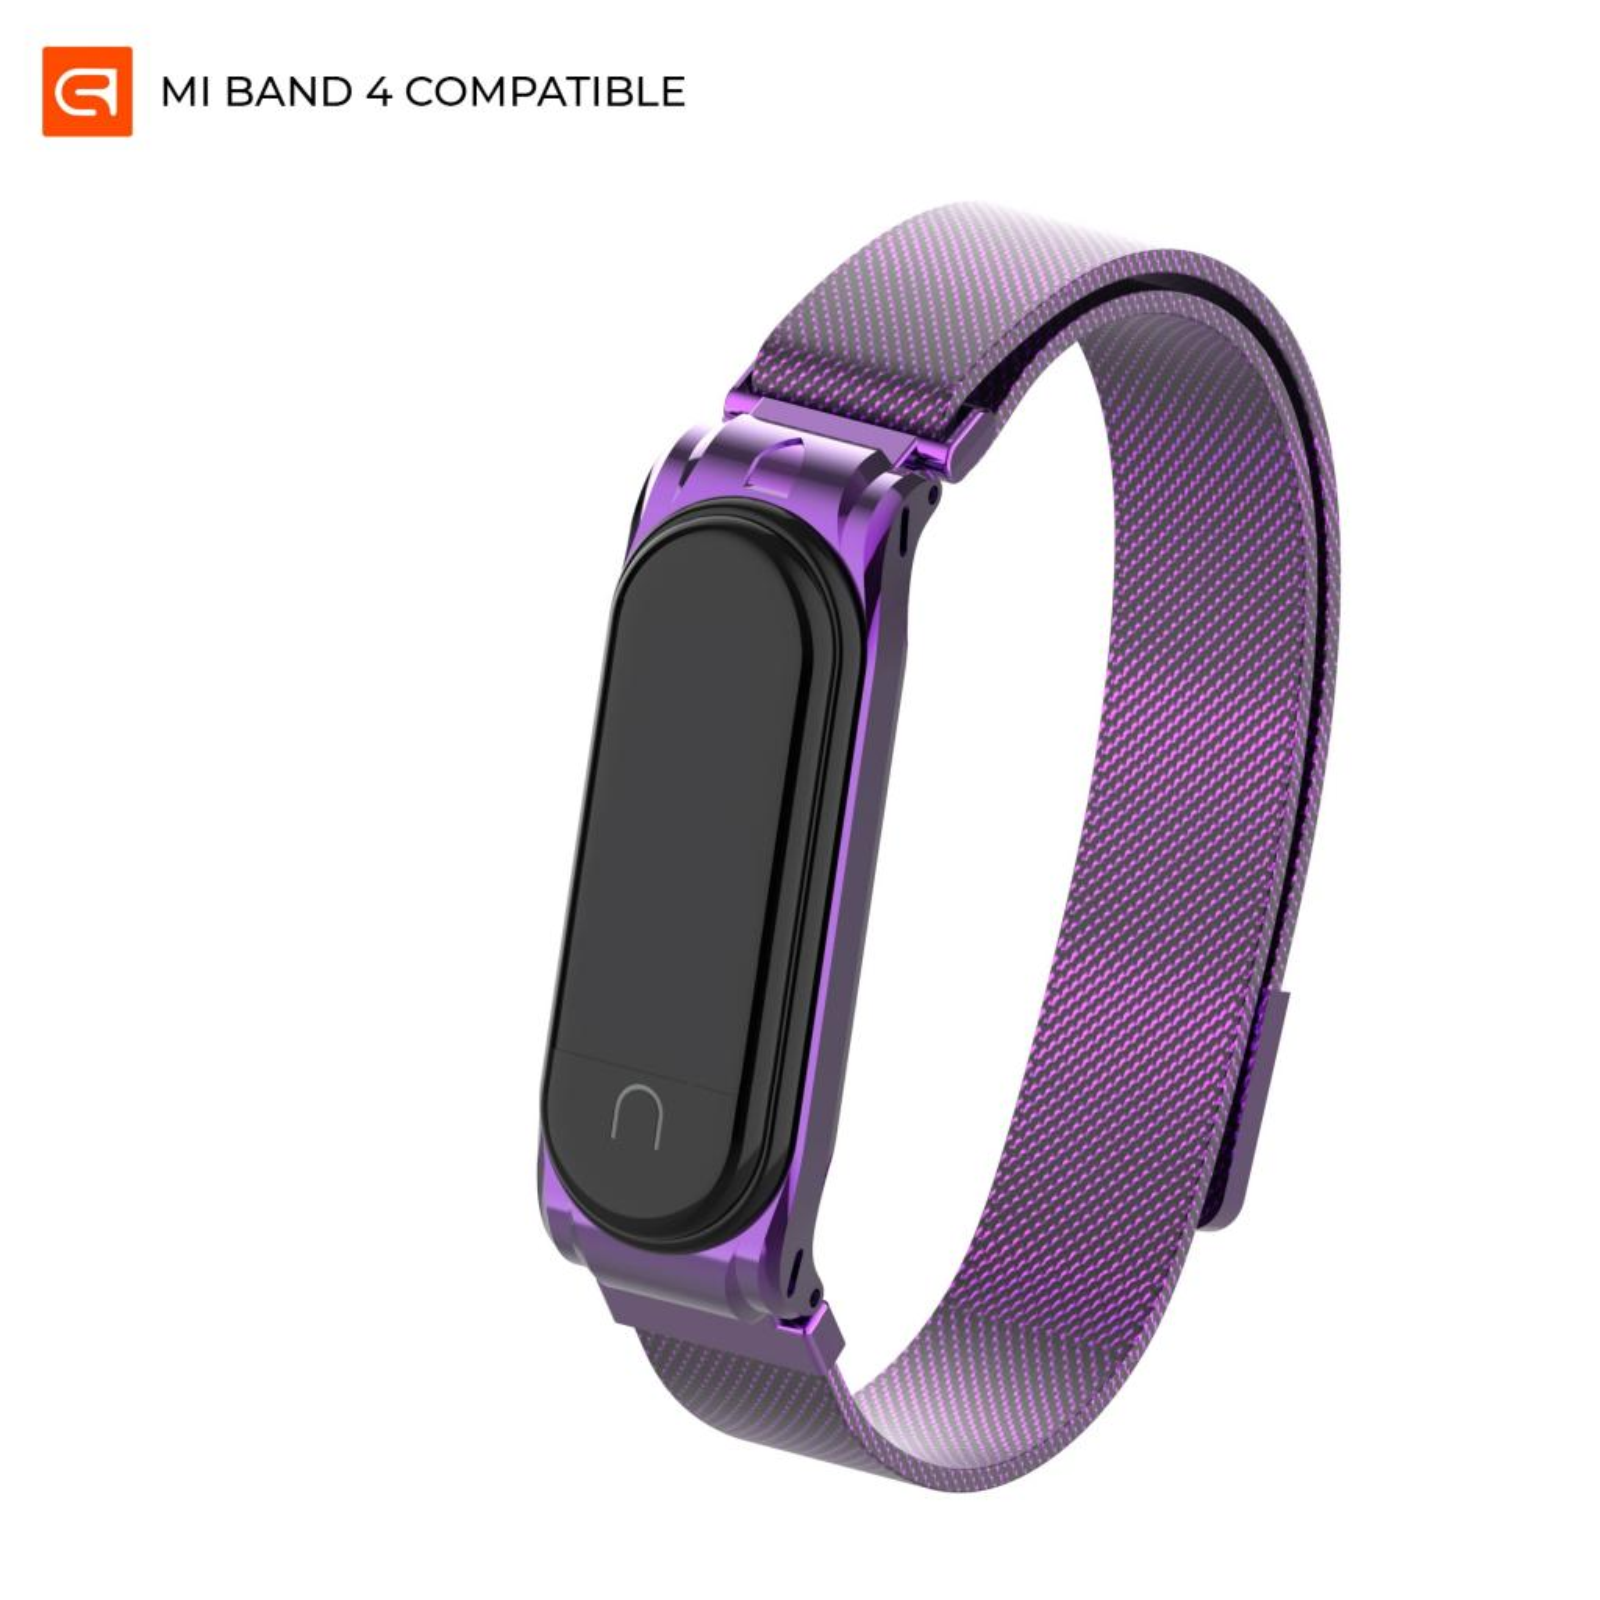 Ремешок для фитнес браслета Armorstandart Milanese Magnetic Band для Xiaomi Mi Band 4/3 Purple (ARM55028)